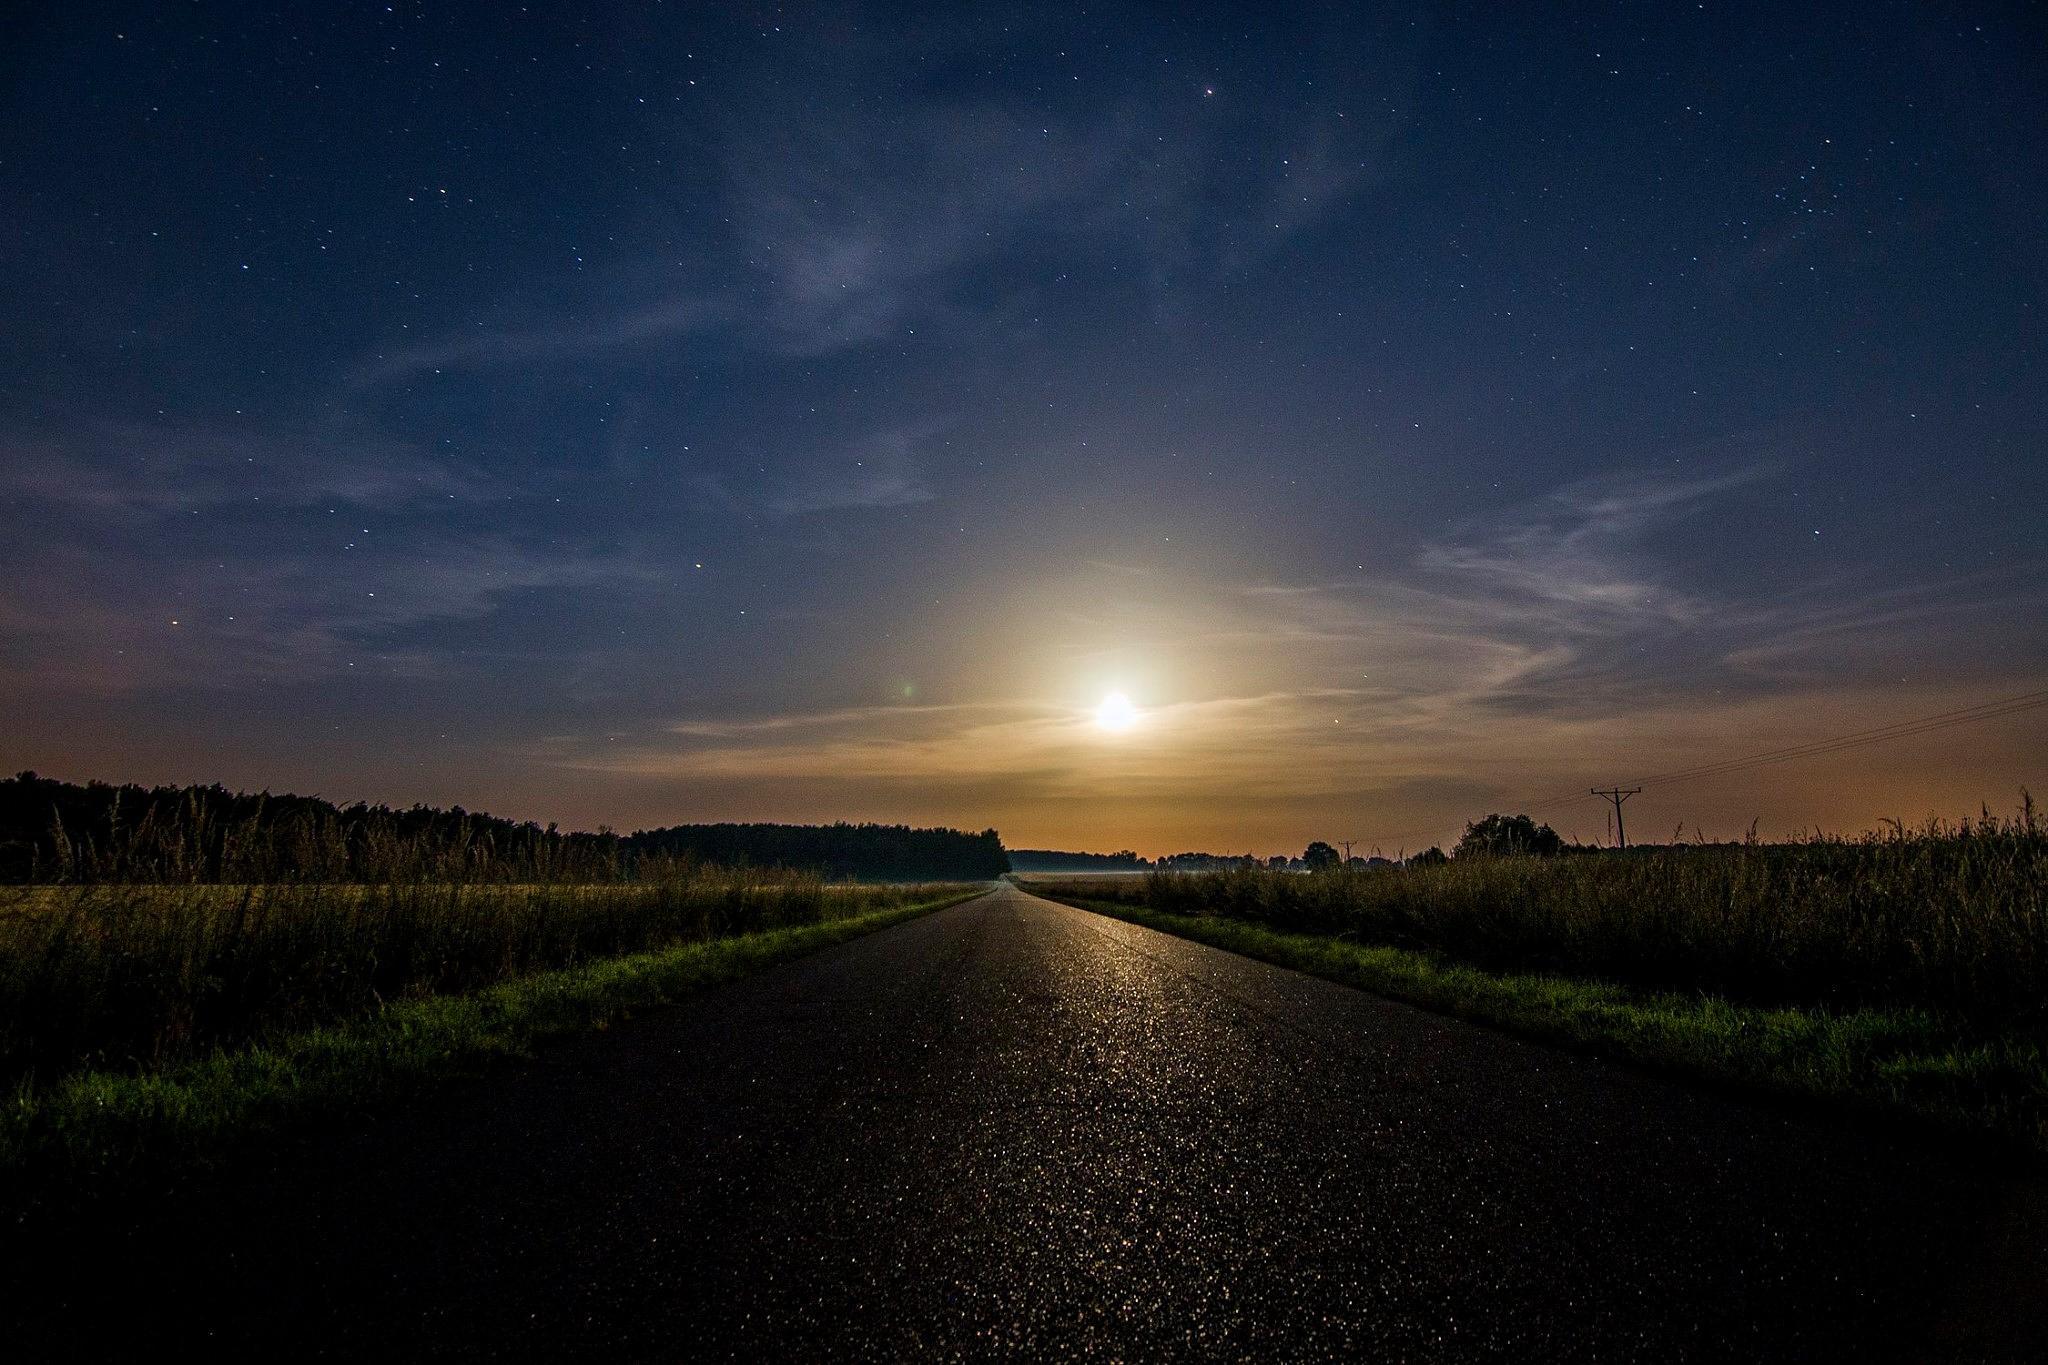 Moonlight Road by Waldemar Sadlowski